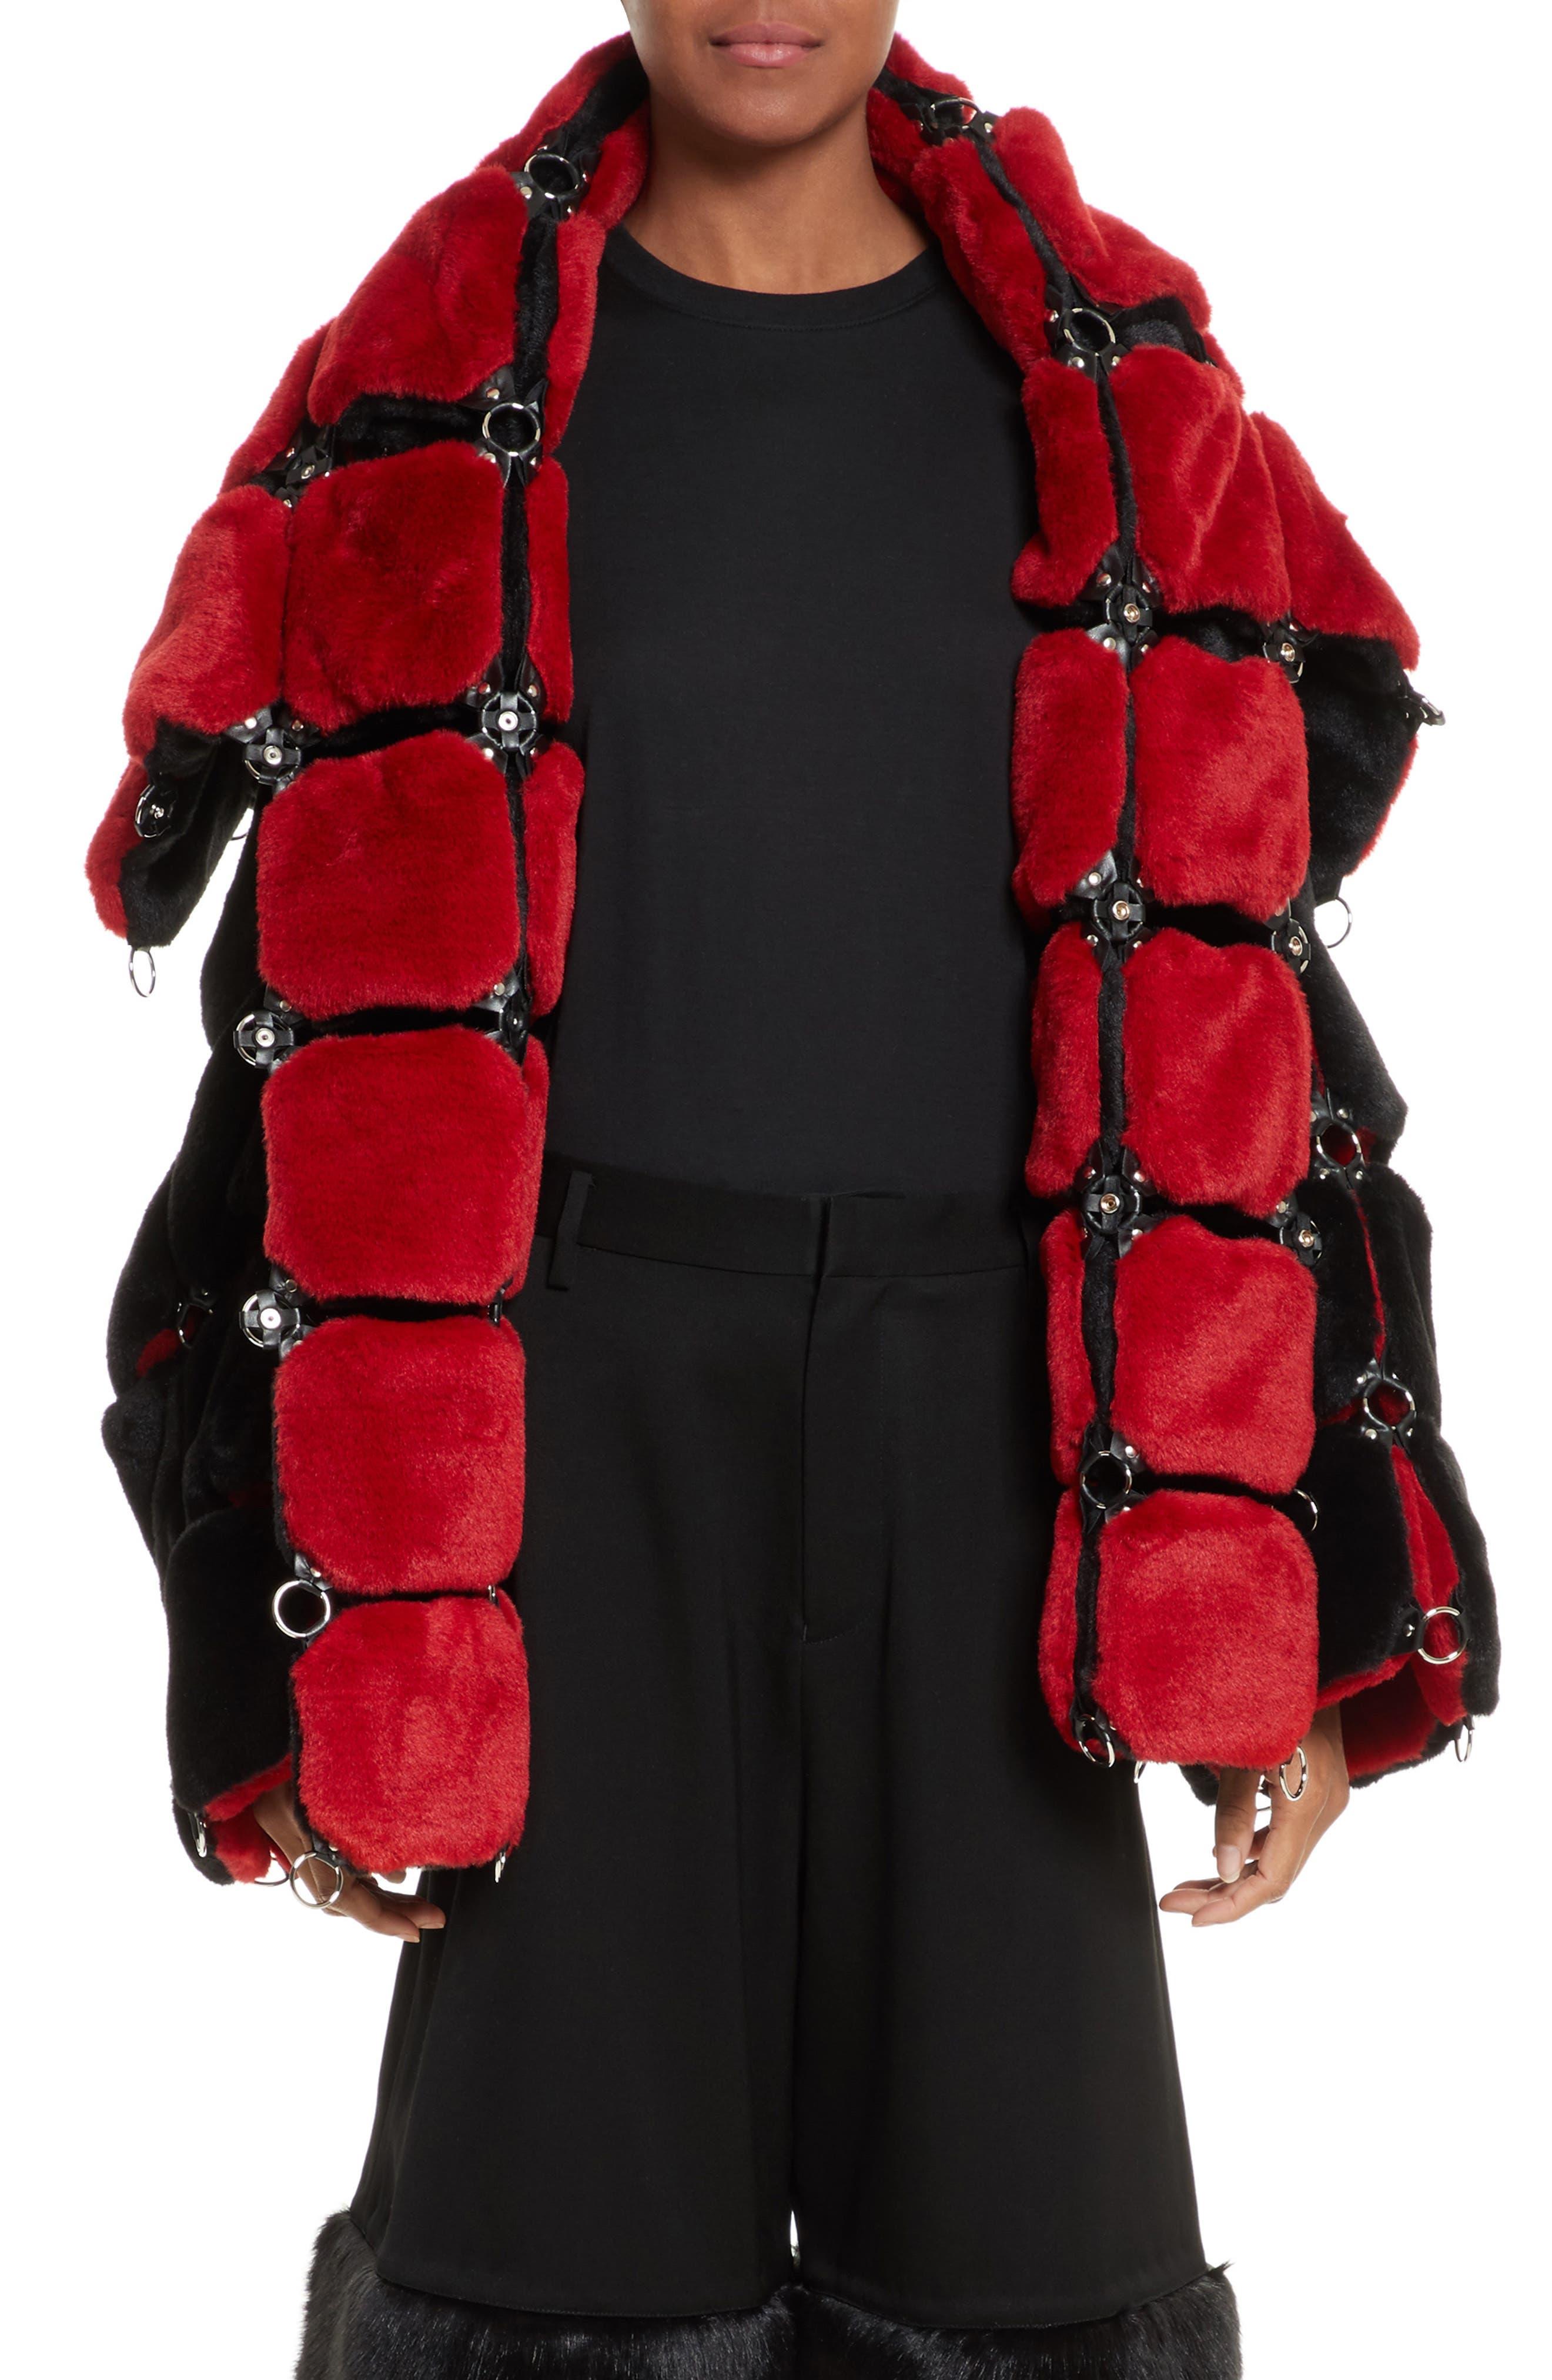 Main Image - noir kei ninomiya Faux Fur Coat with Chain Mail Detail